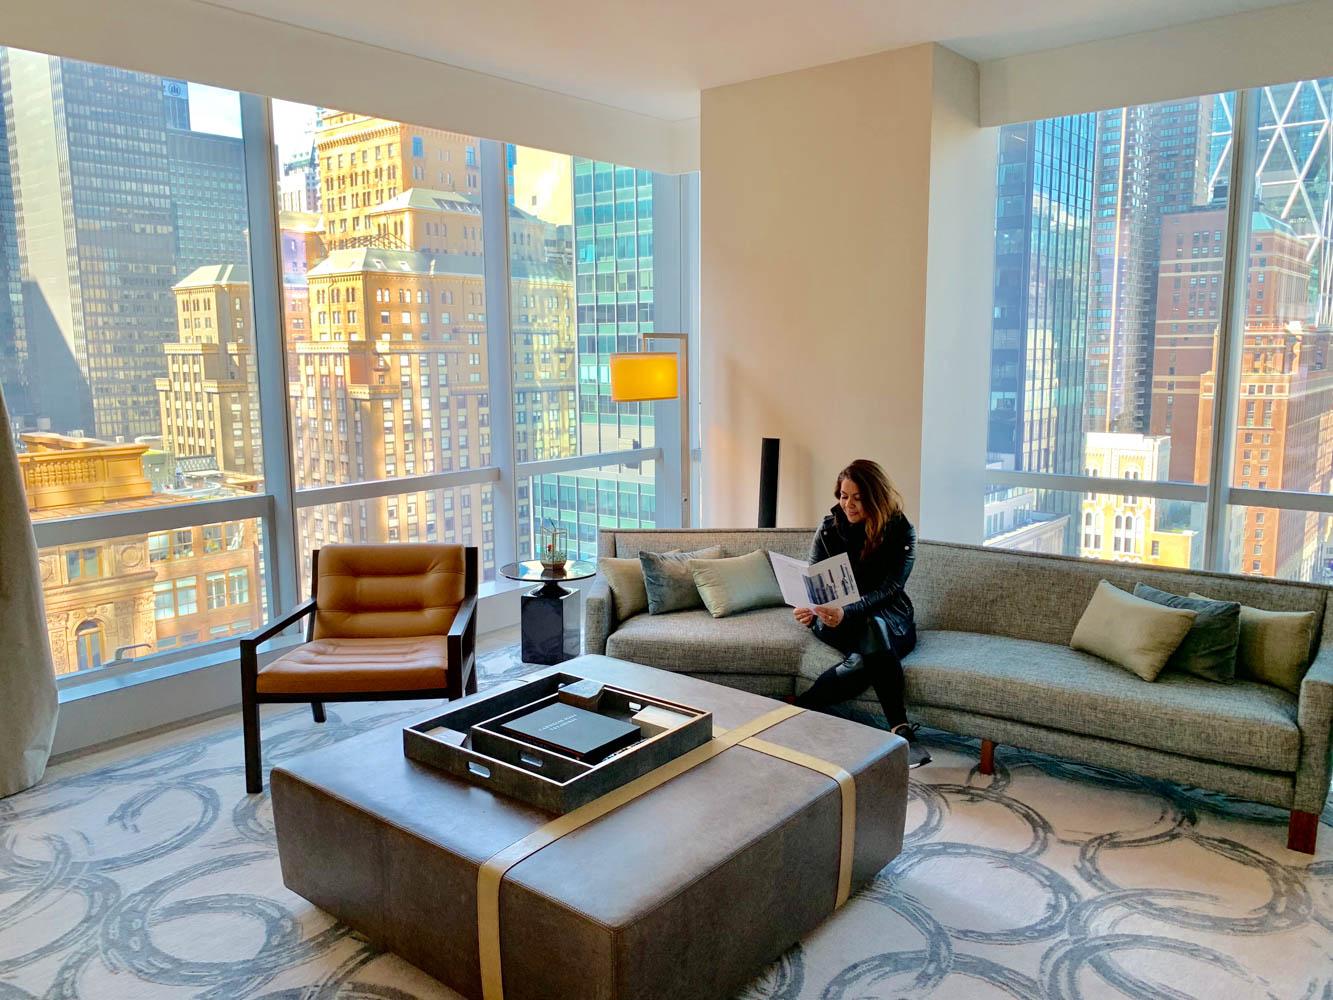 NYC Travel Tips_New York Travel Ideas-2.jpg